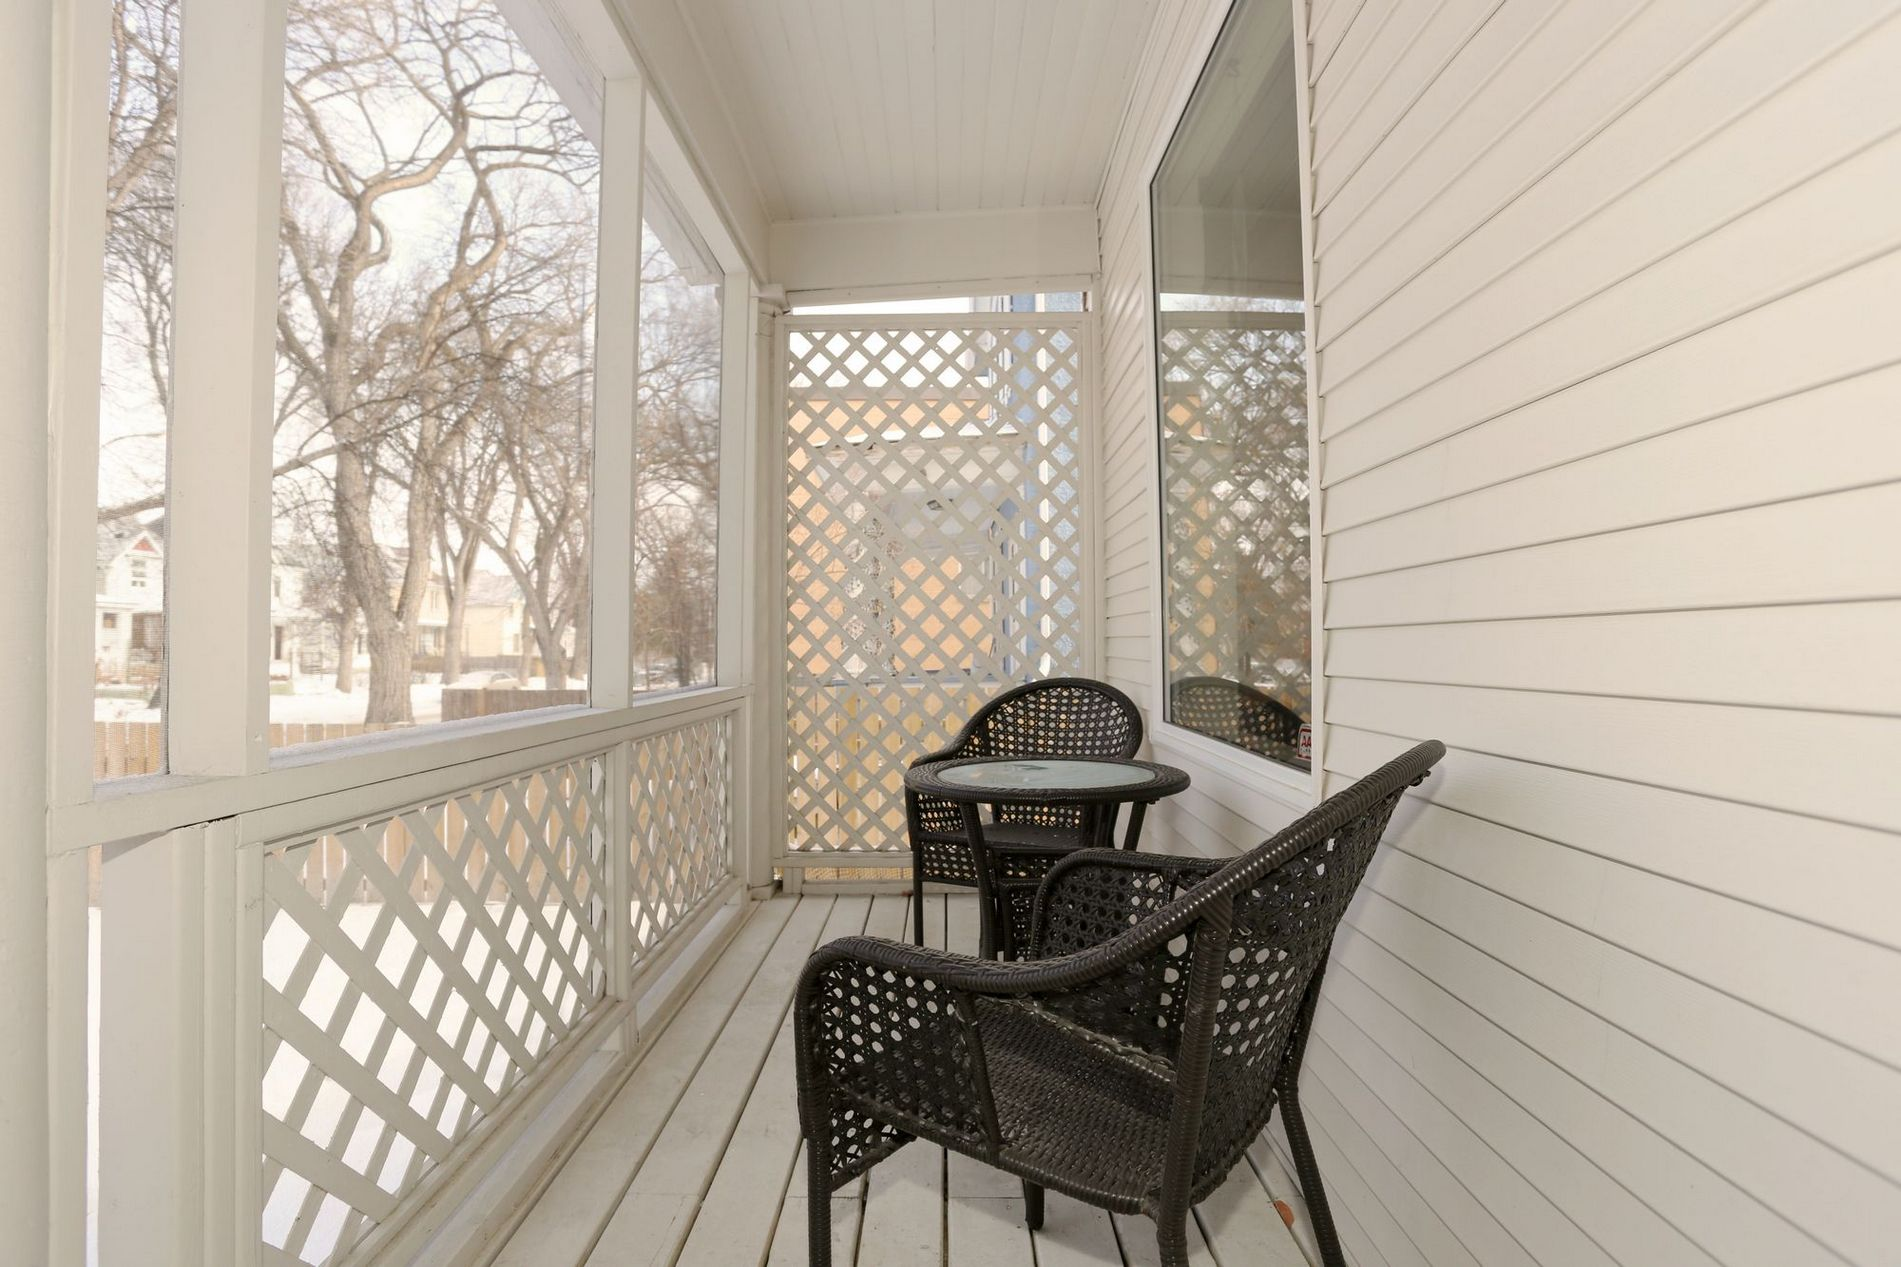 612 Mcmillan Avenue, Winnipeg, Manitoba  R3L 0N6 - Photo 1 - 1502218